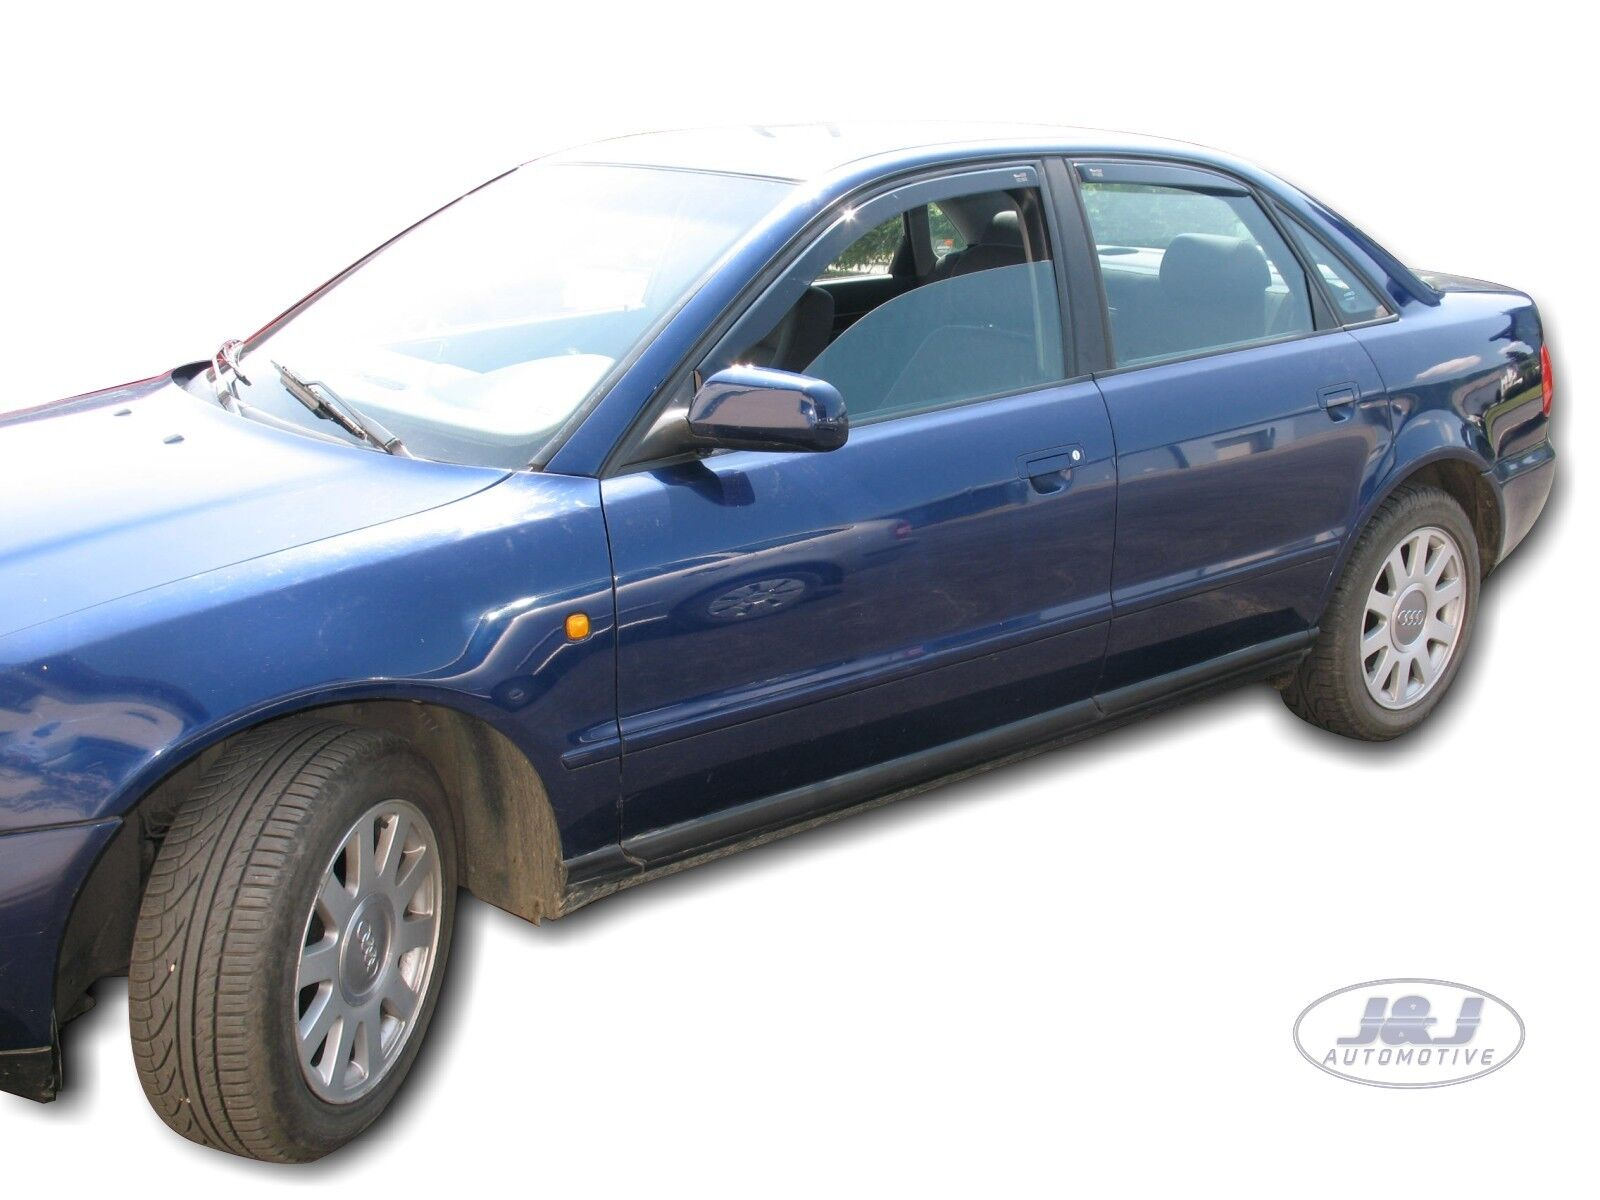 J/&J AUTOMOTIVE DEFLETTORI ARIA ANTITURBO per Audi A4 B5 5 porte Break 1995-2001 4pc